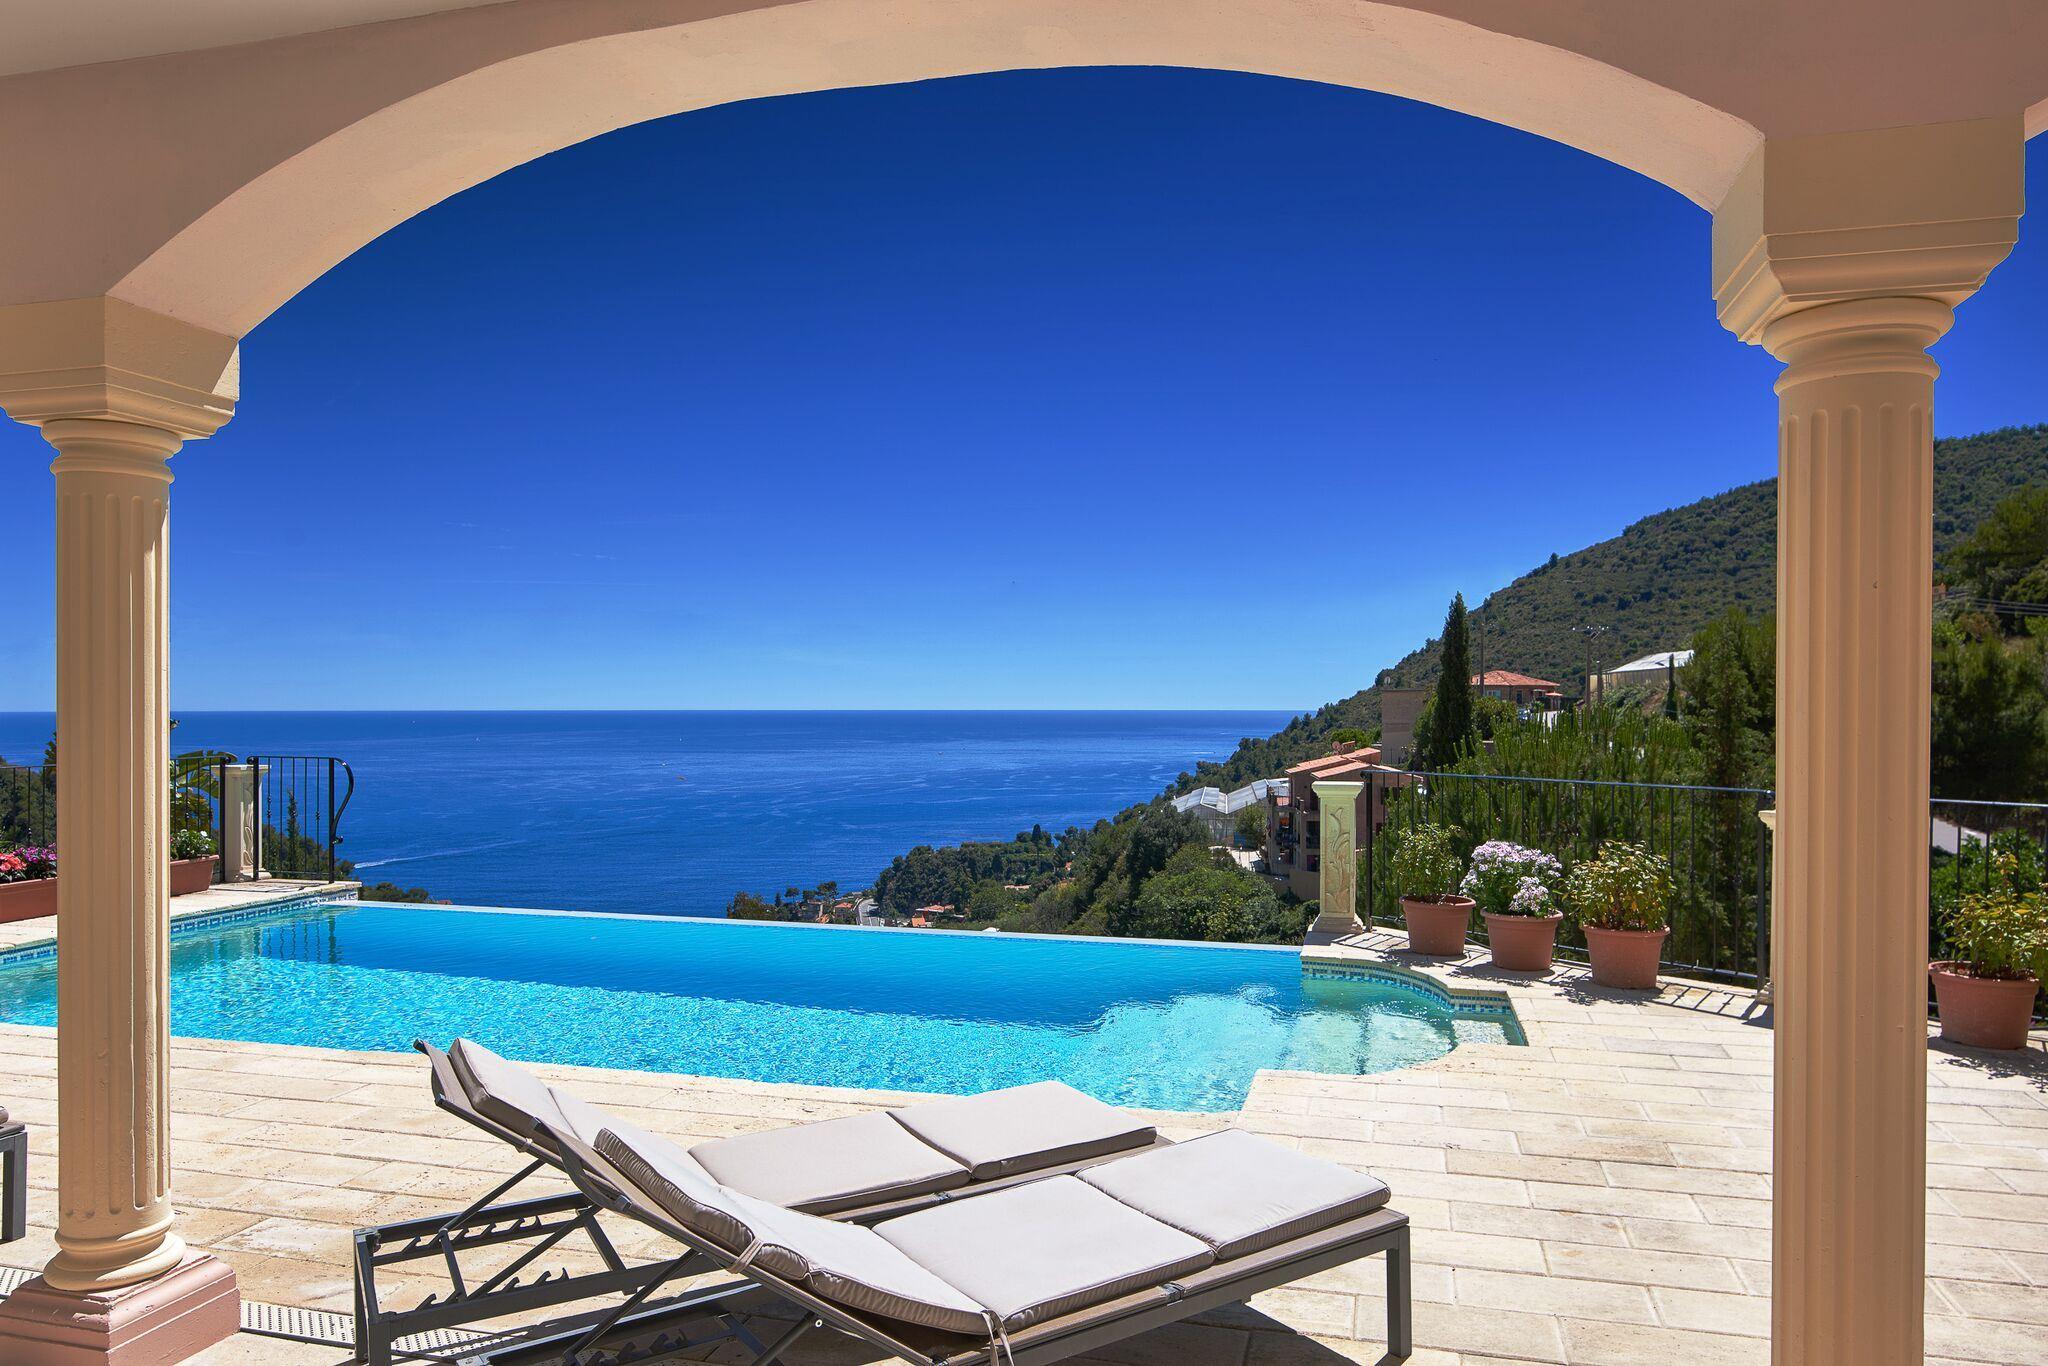 Moradia para Venda às Provencal style villa - sea views Eze, Provença-Alpes-Costa Azul, 06360 França